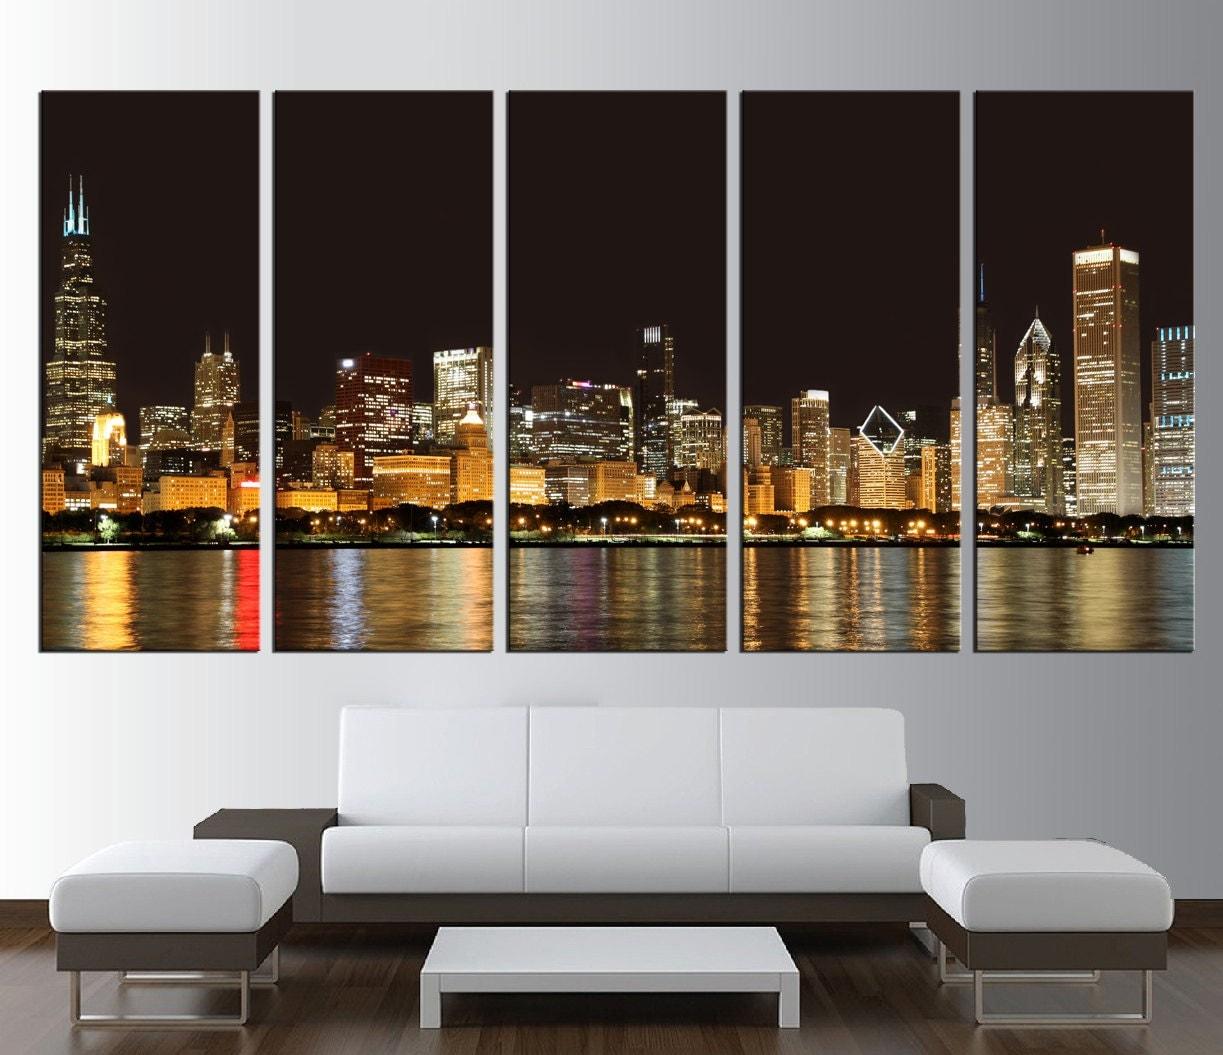 large print chicago skyline wall art canvas, extra large wall art, chicago city wall